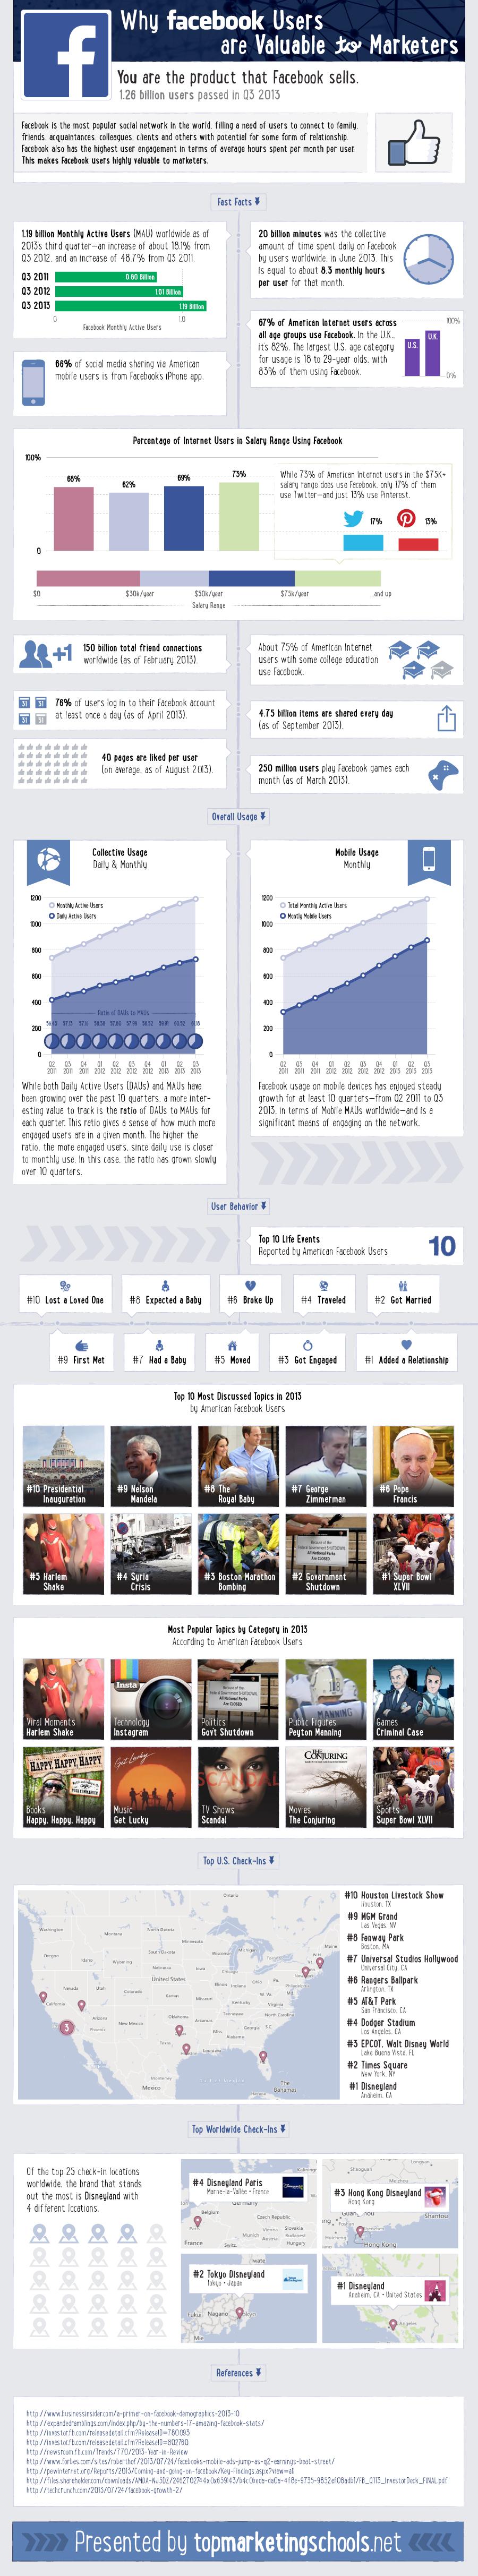 2013 Facebook Stats from topmarketingschools.net/facebook